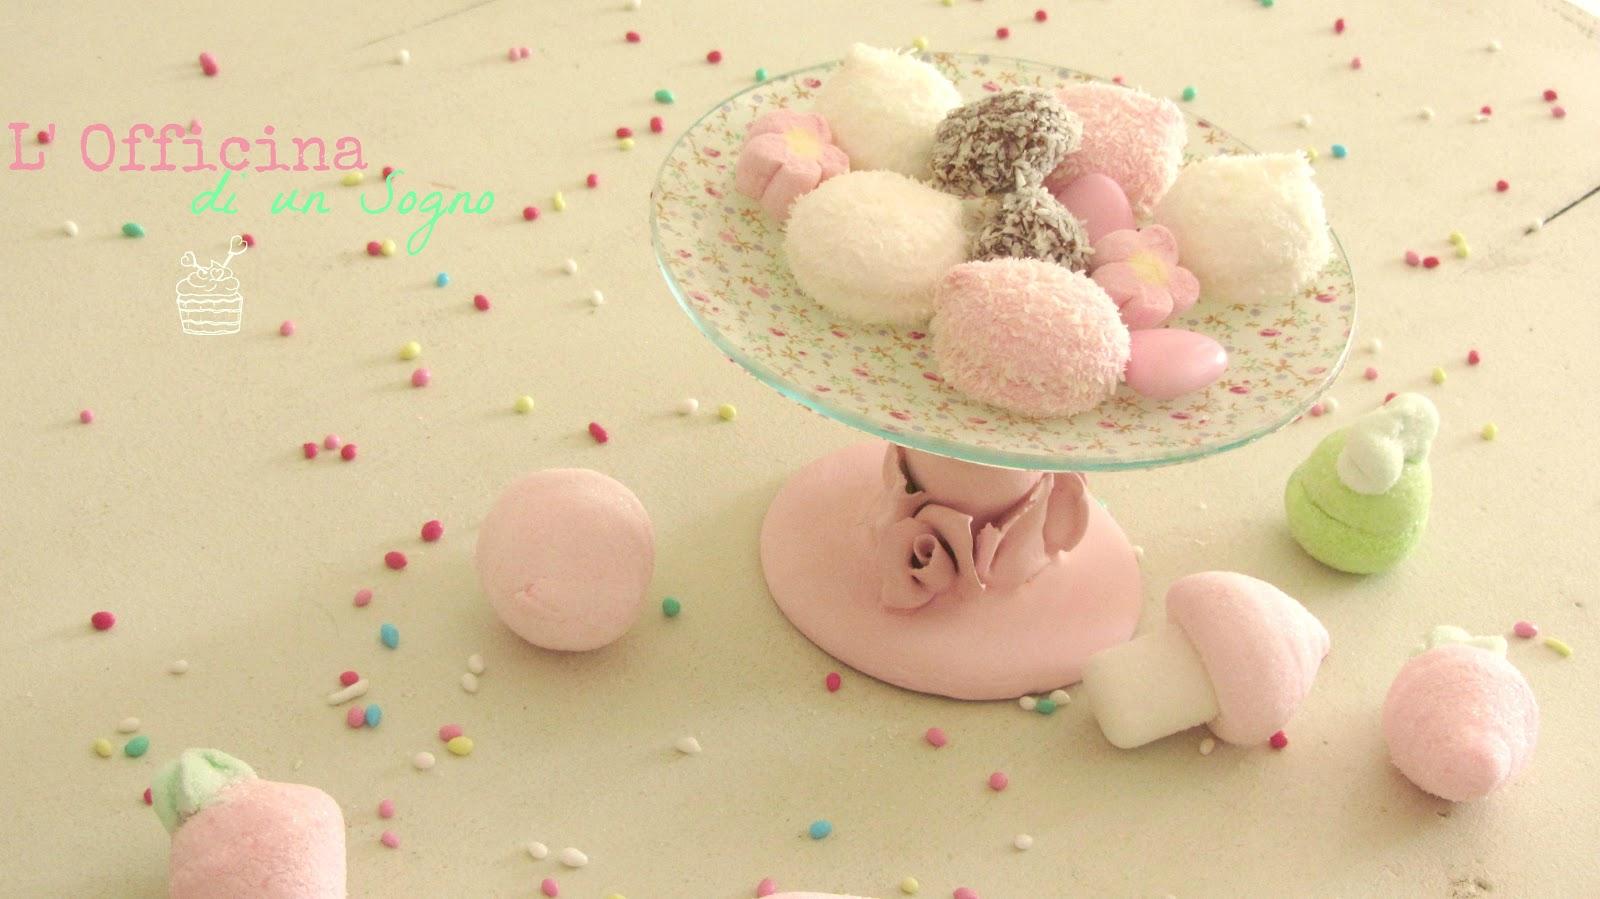 L'officina di un sogno: alzatina per dolci diy